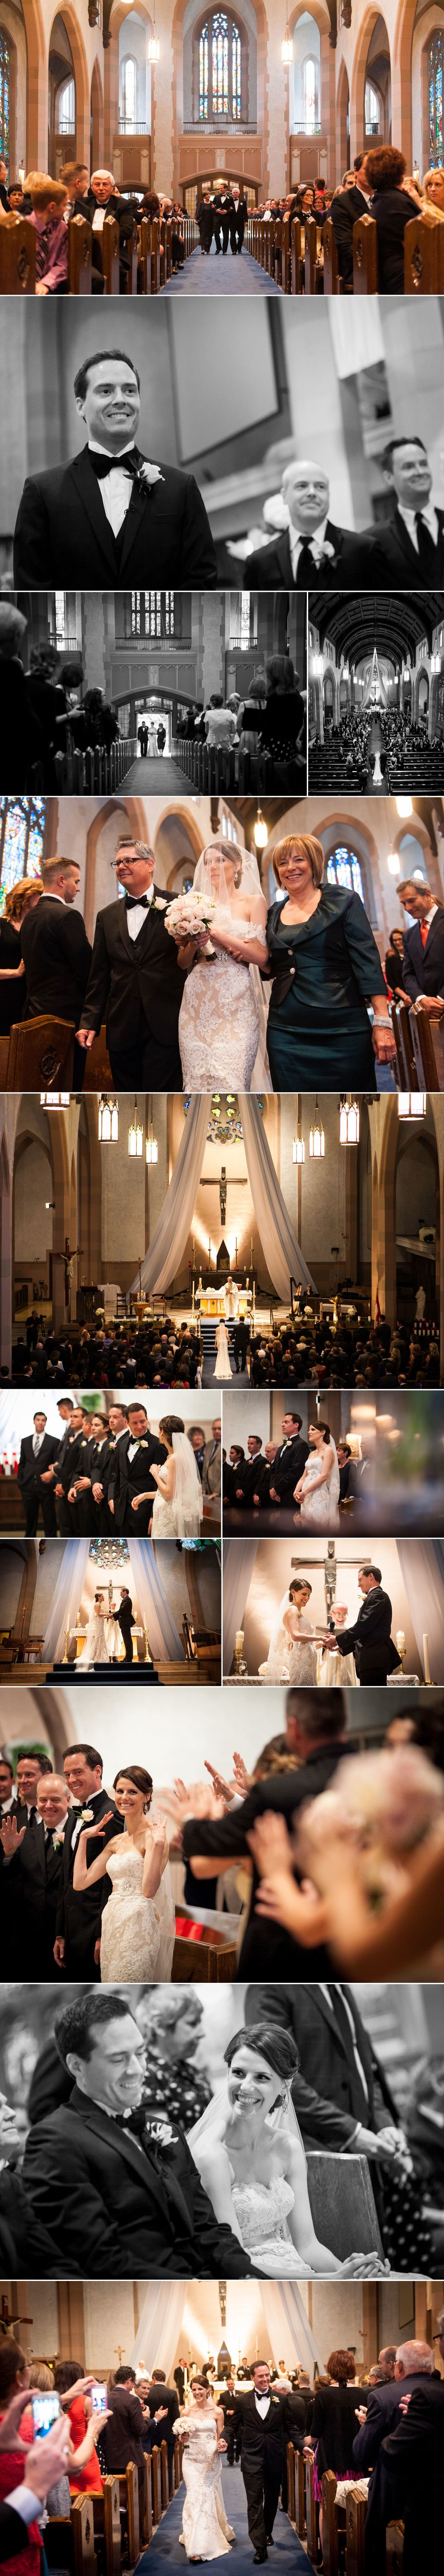 Wedding ceremony at Blessed Sacrament Church